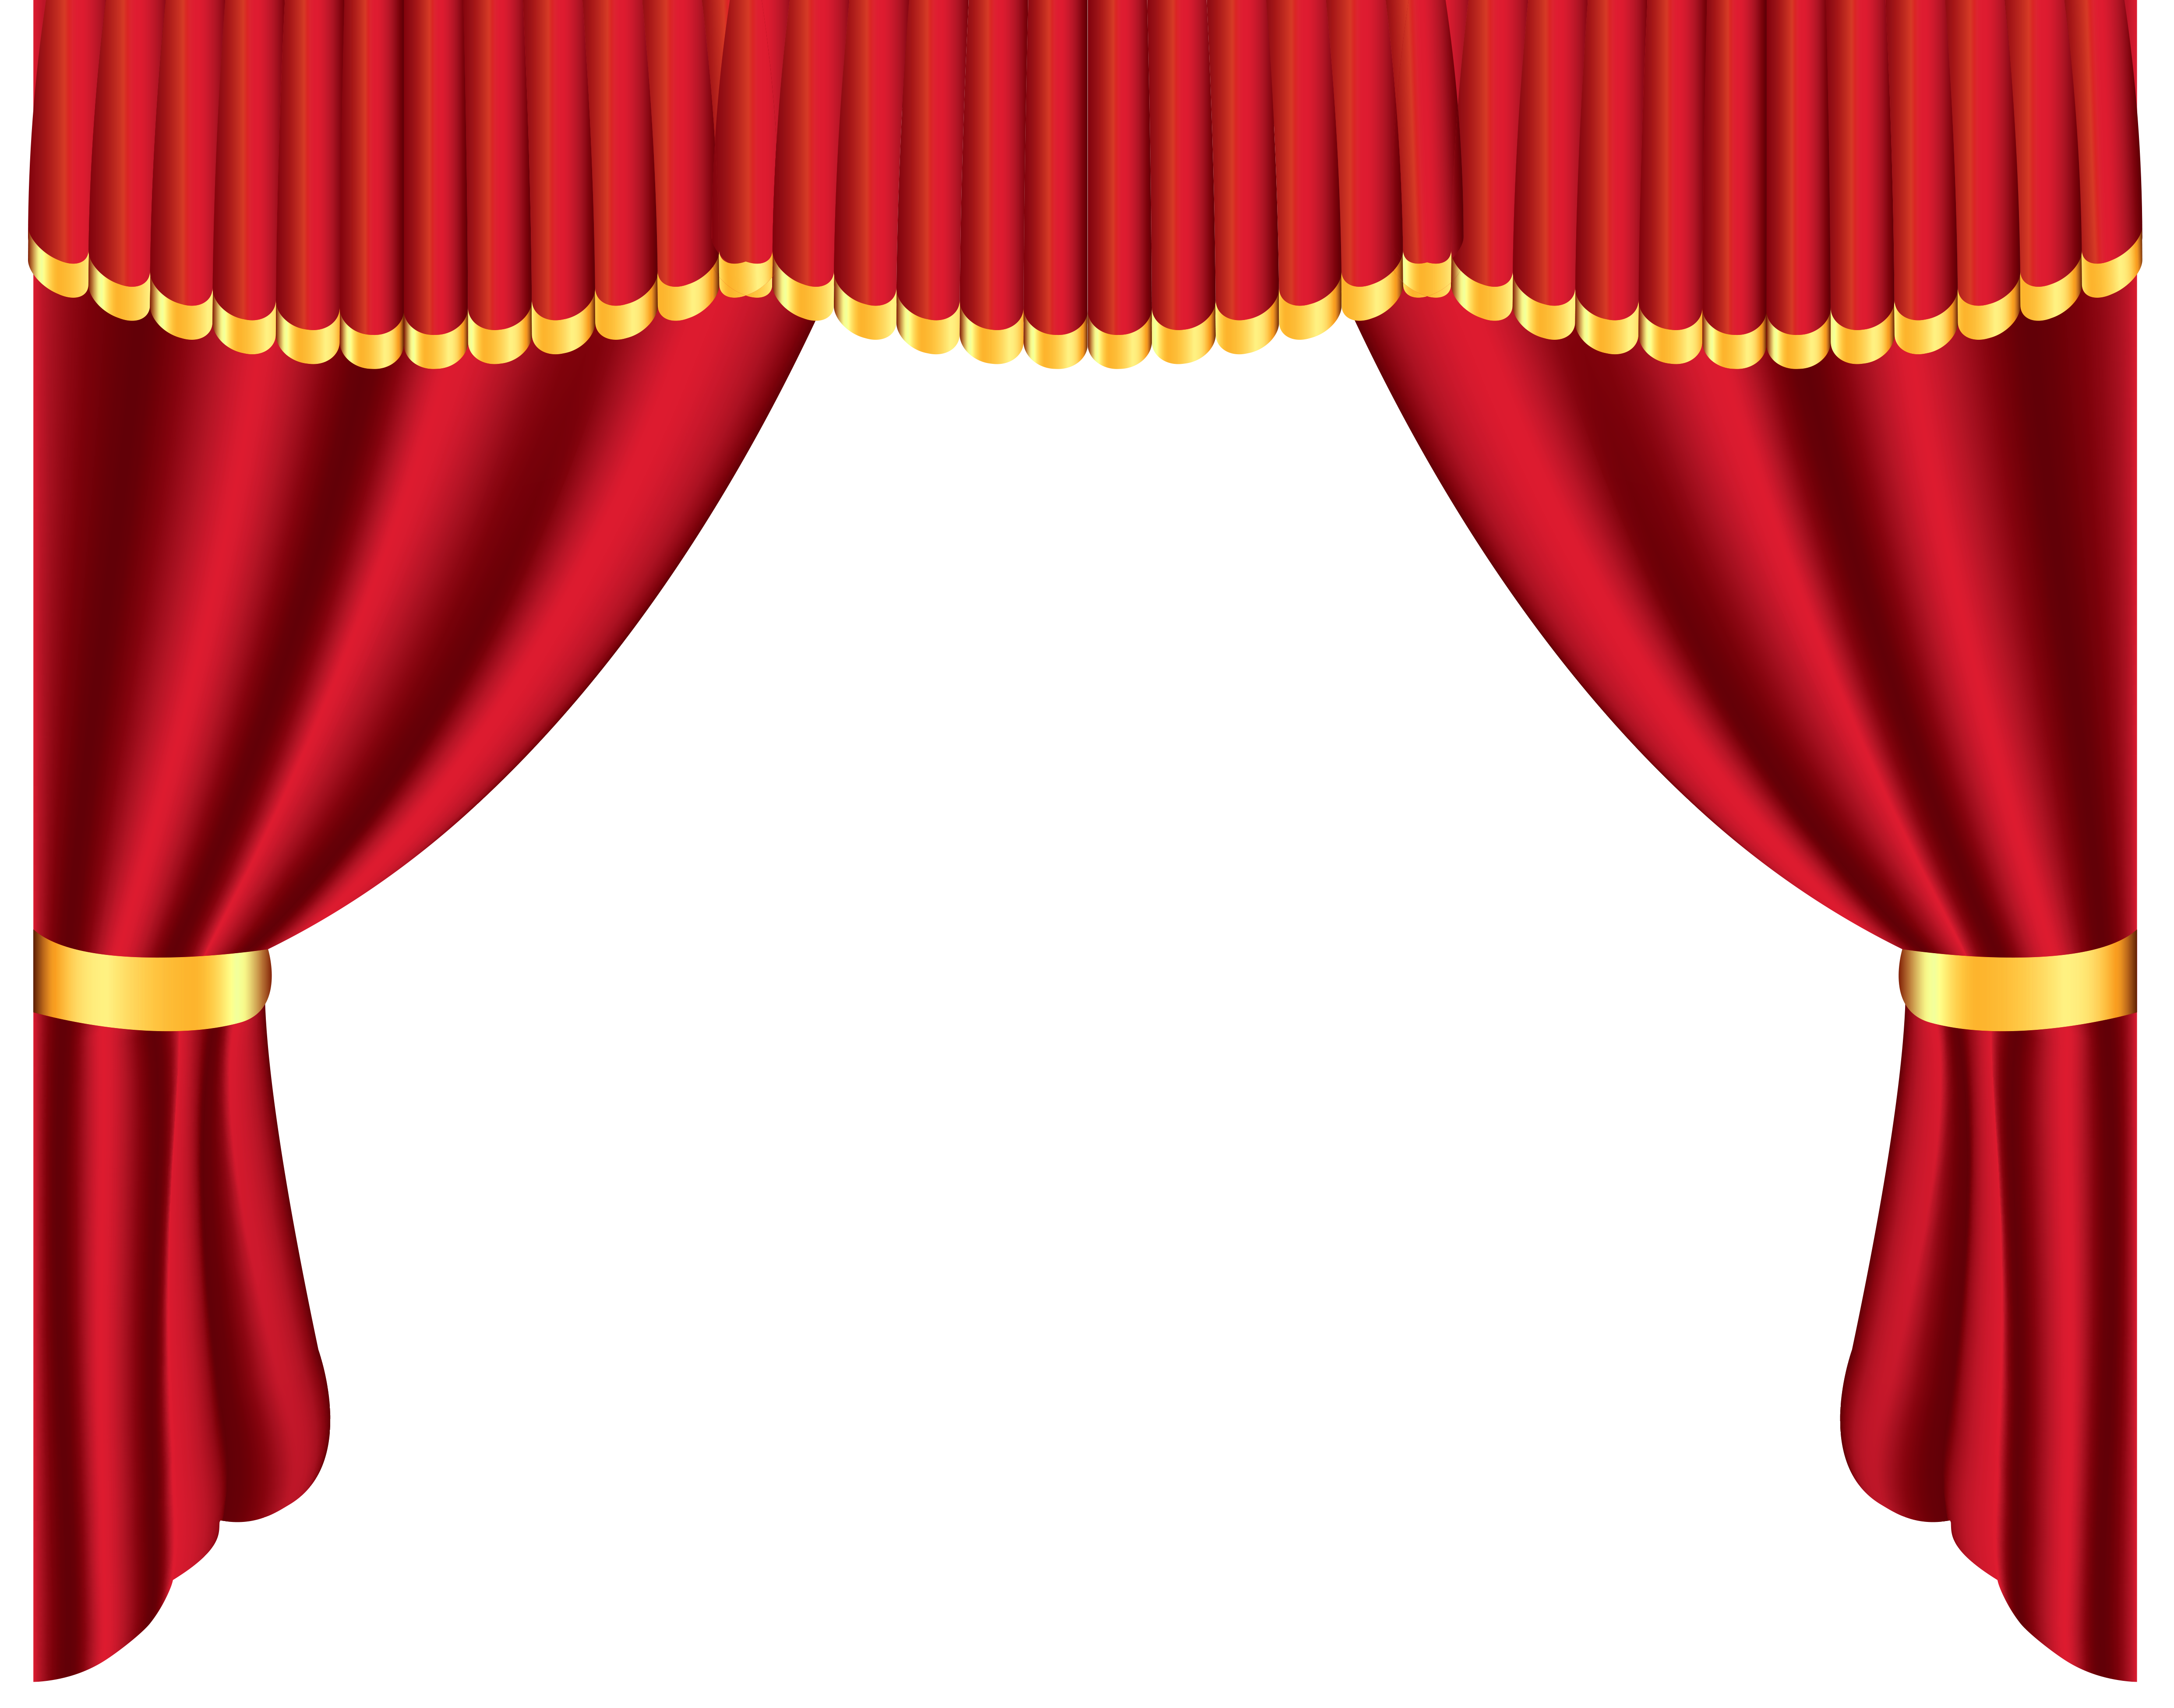 Transparent Red Curtain Png Clipart Cutecurtainsideas Cerceve Tasarim Arkaplan Tasarimlari